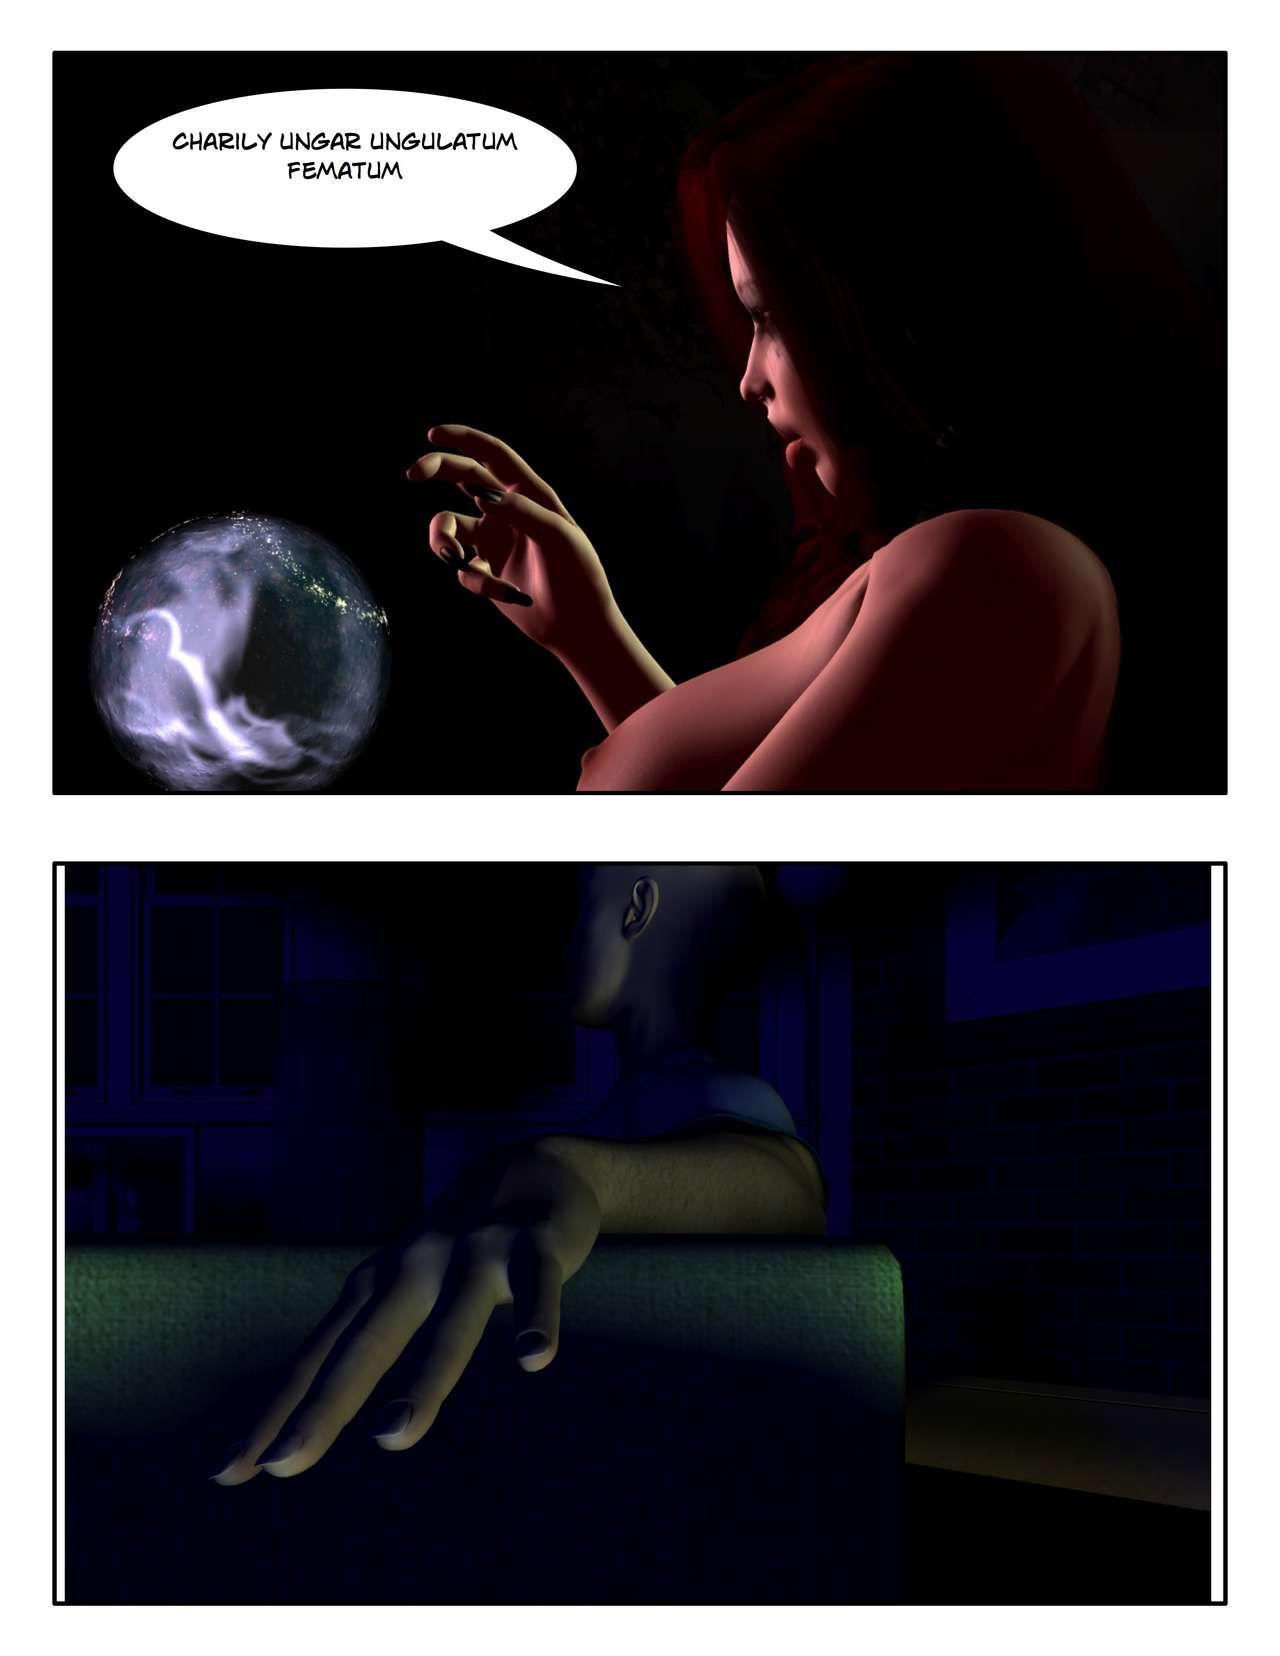 [Ariana] Second Life - part 2